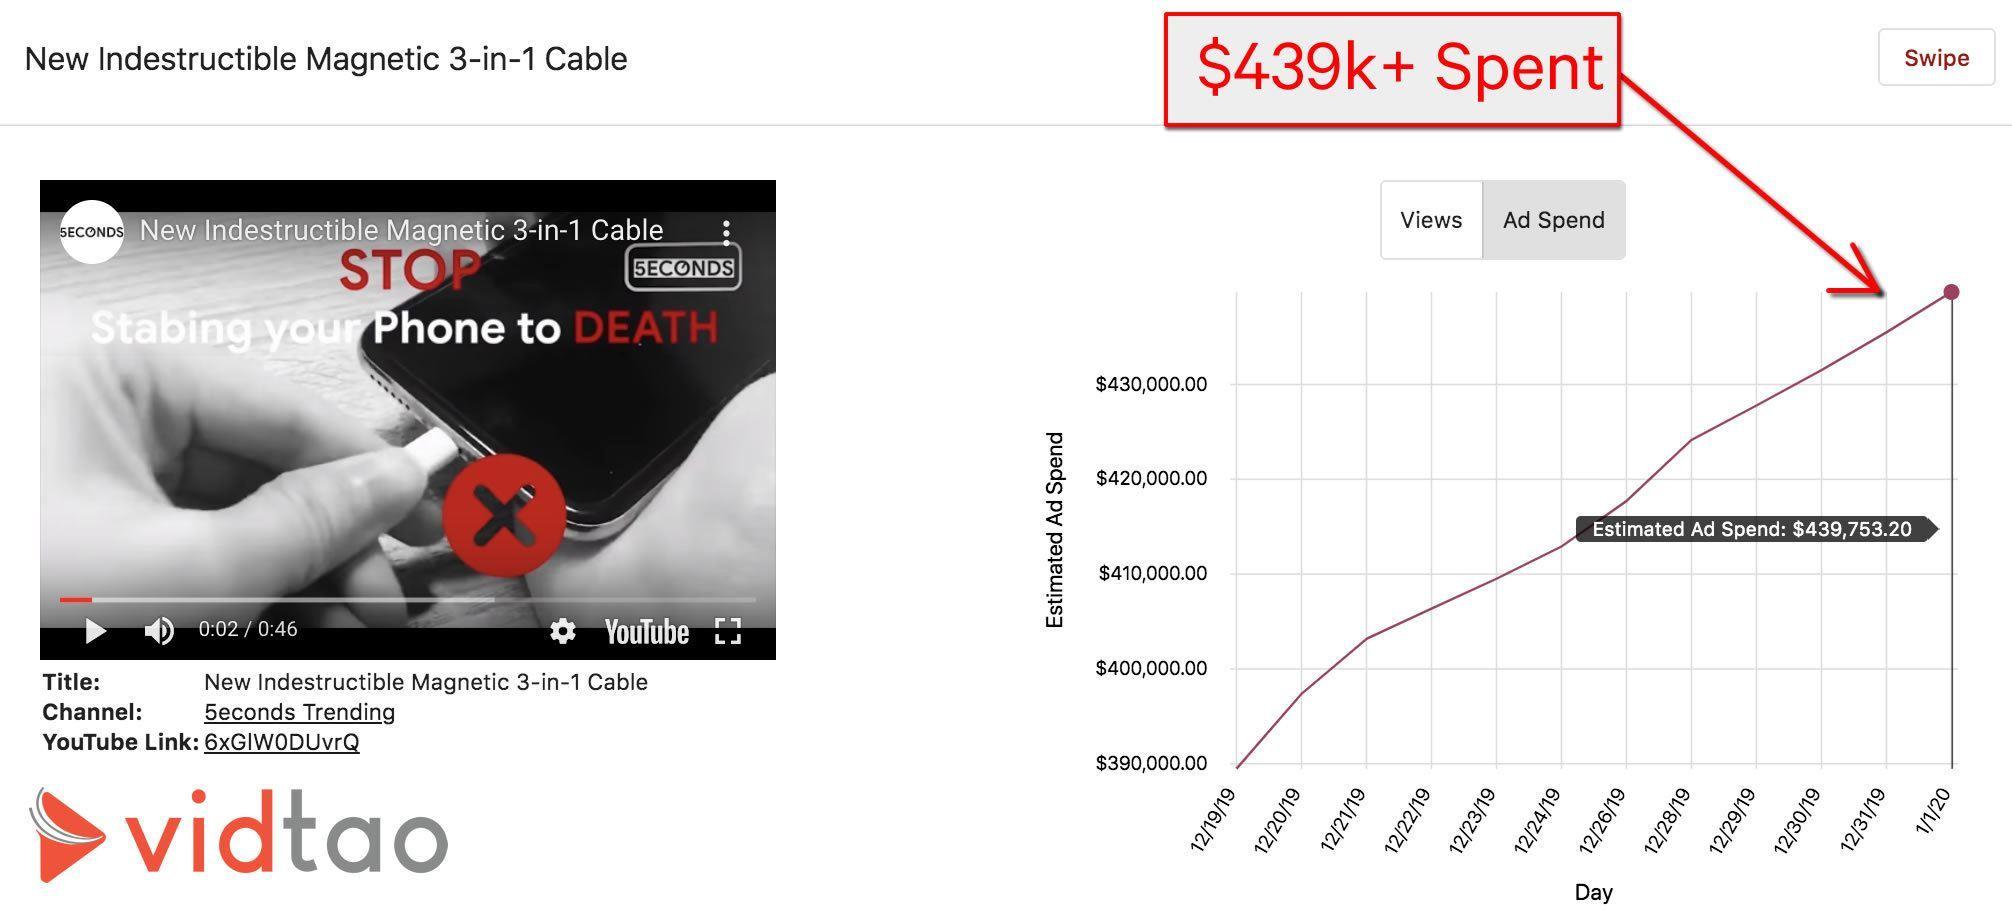 youtube-ad-spy-tool-screenshot-cable-screenshot-20200101-1